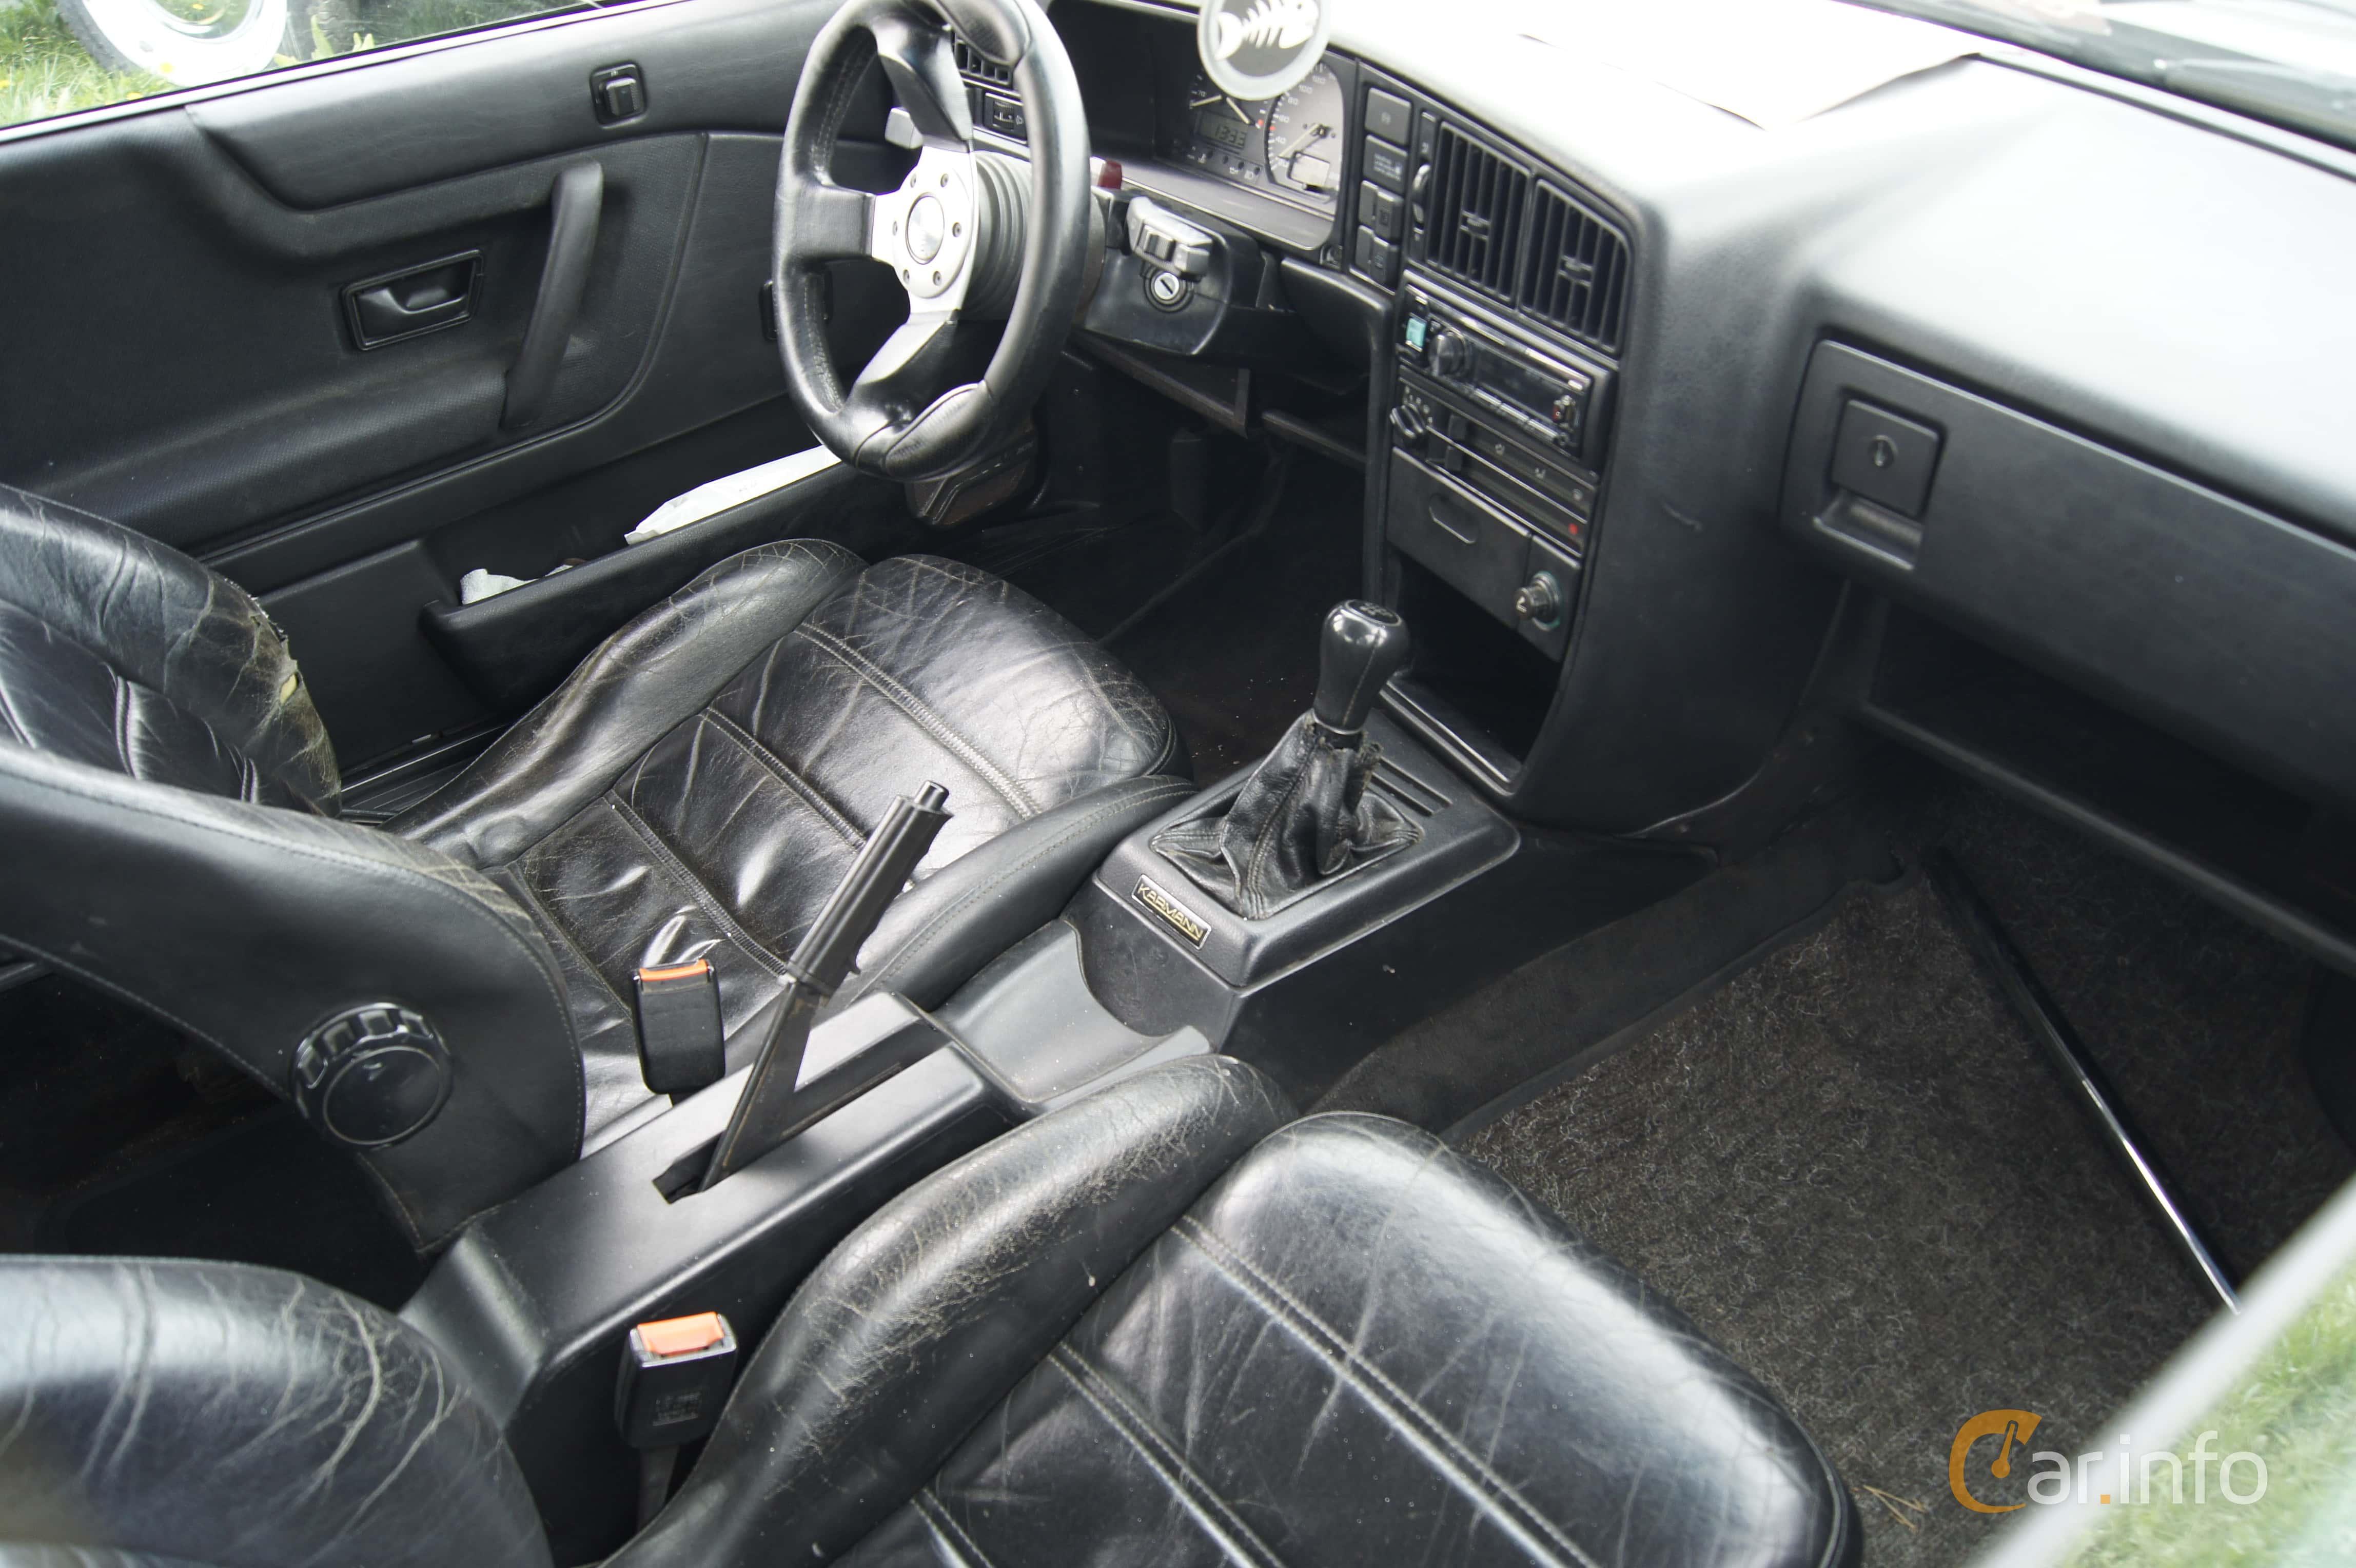 Vw Corrado Interior ~ Instainteriors.us